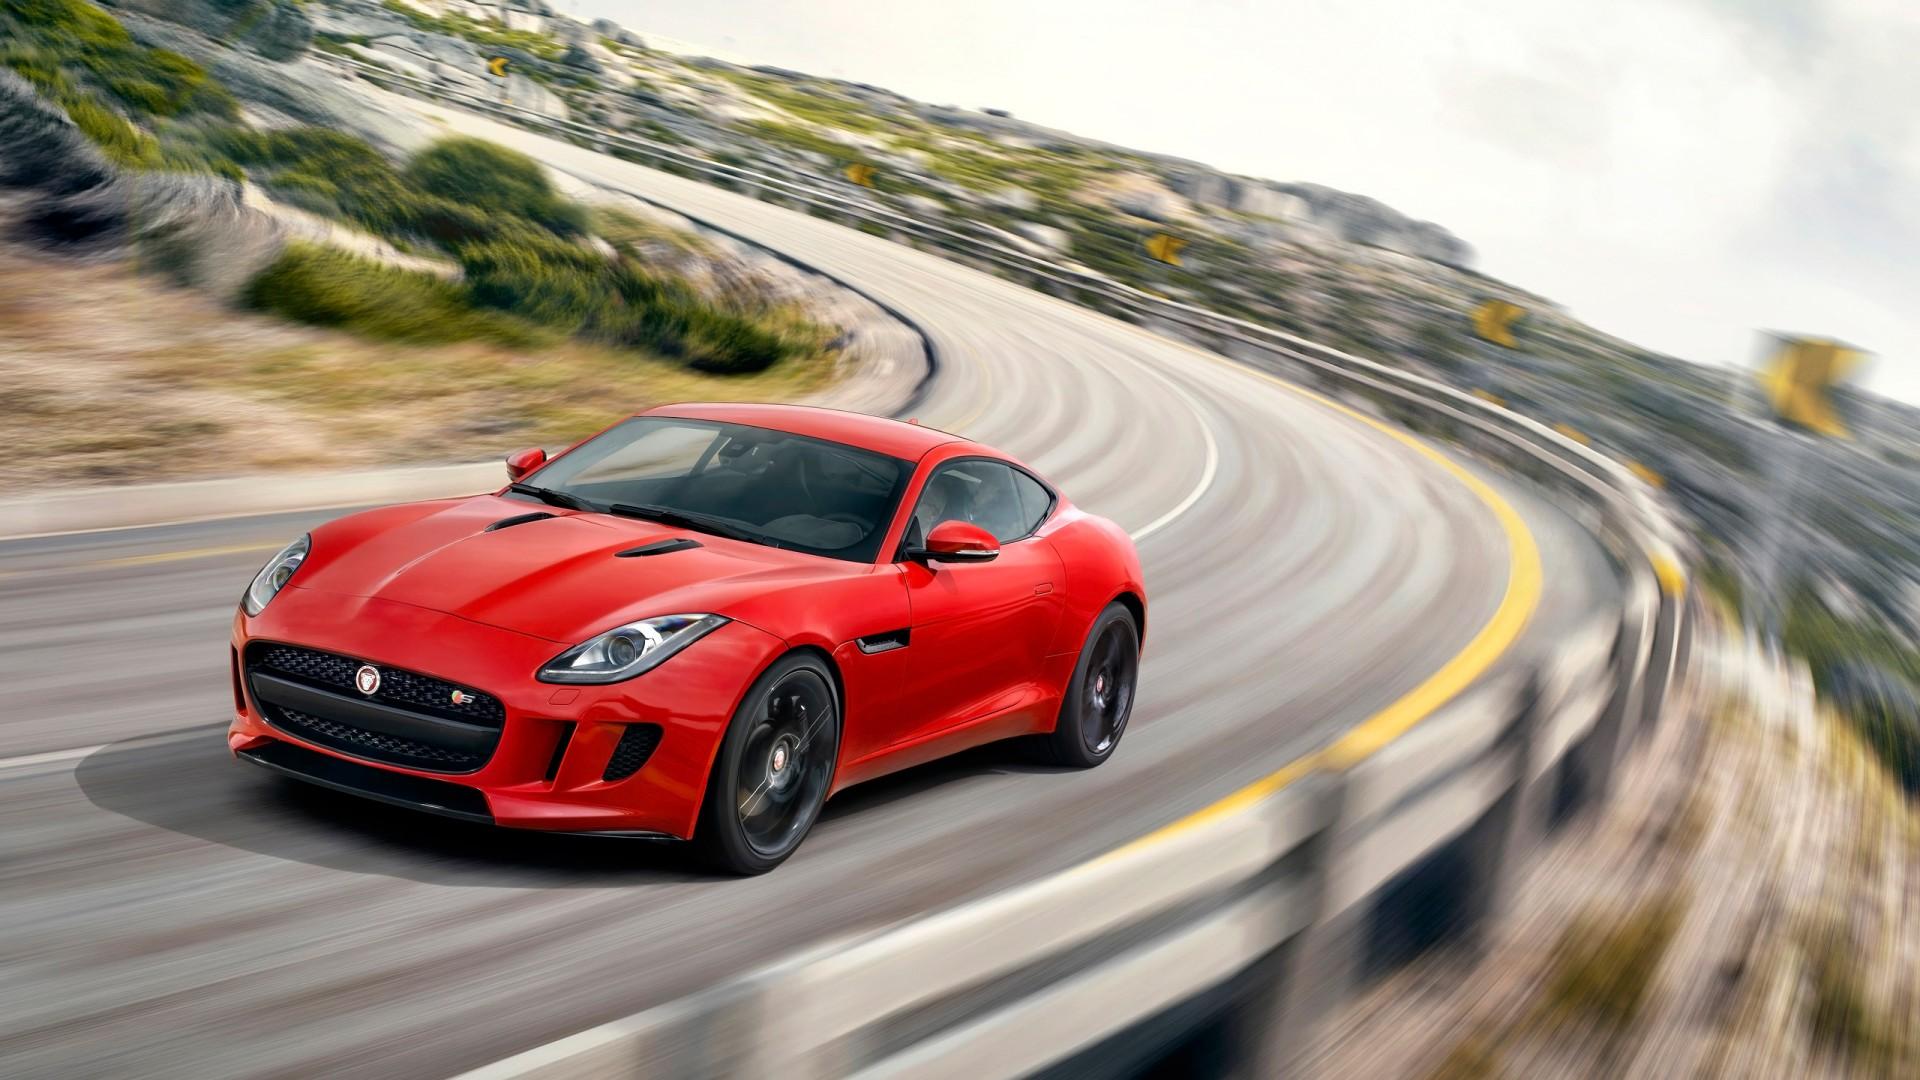 Jaguar F Type Coupe >> 2014 Jaguar F Type R Coupe Salsa Red Wallpaper | HD Car ...